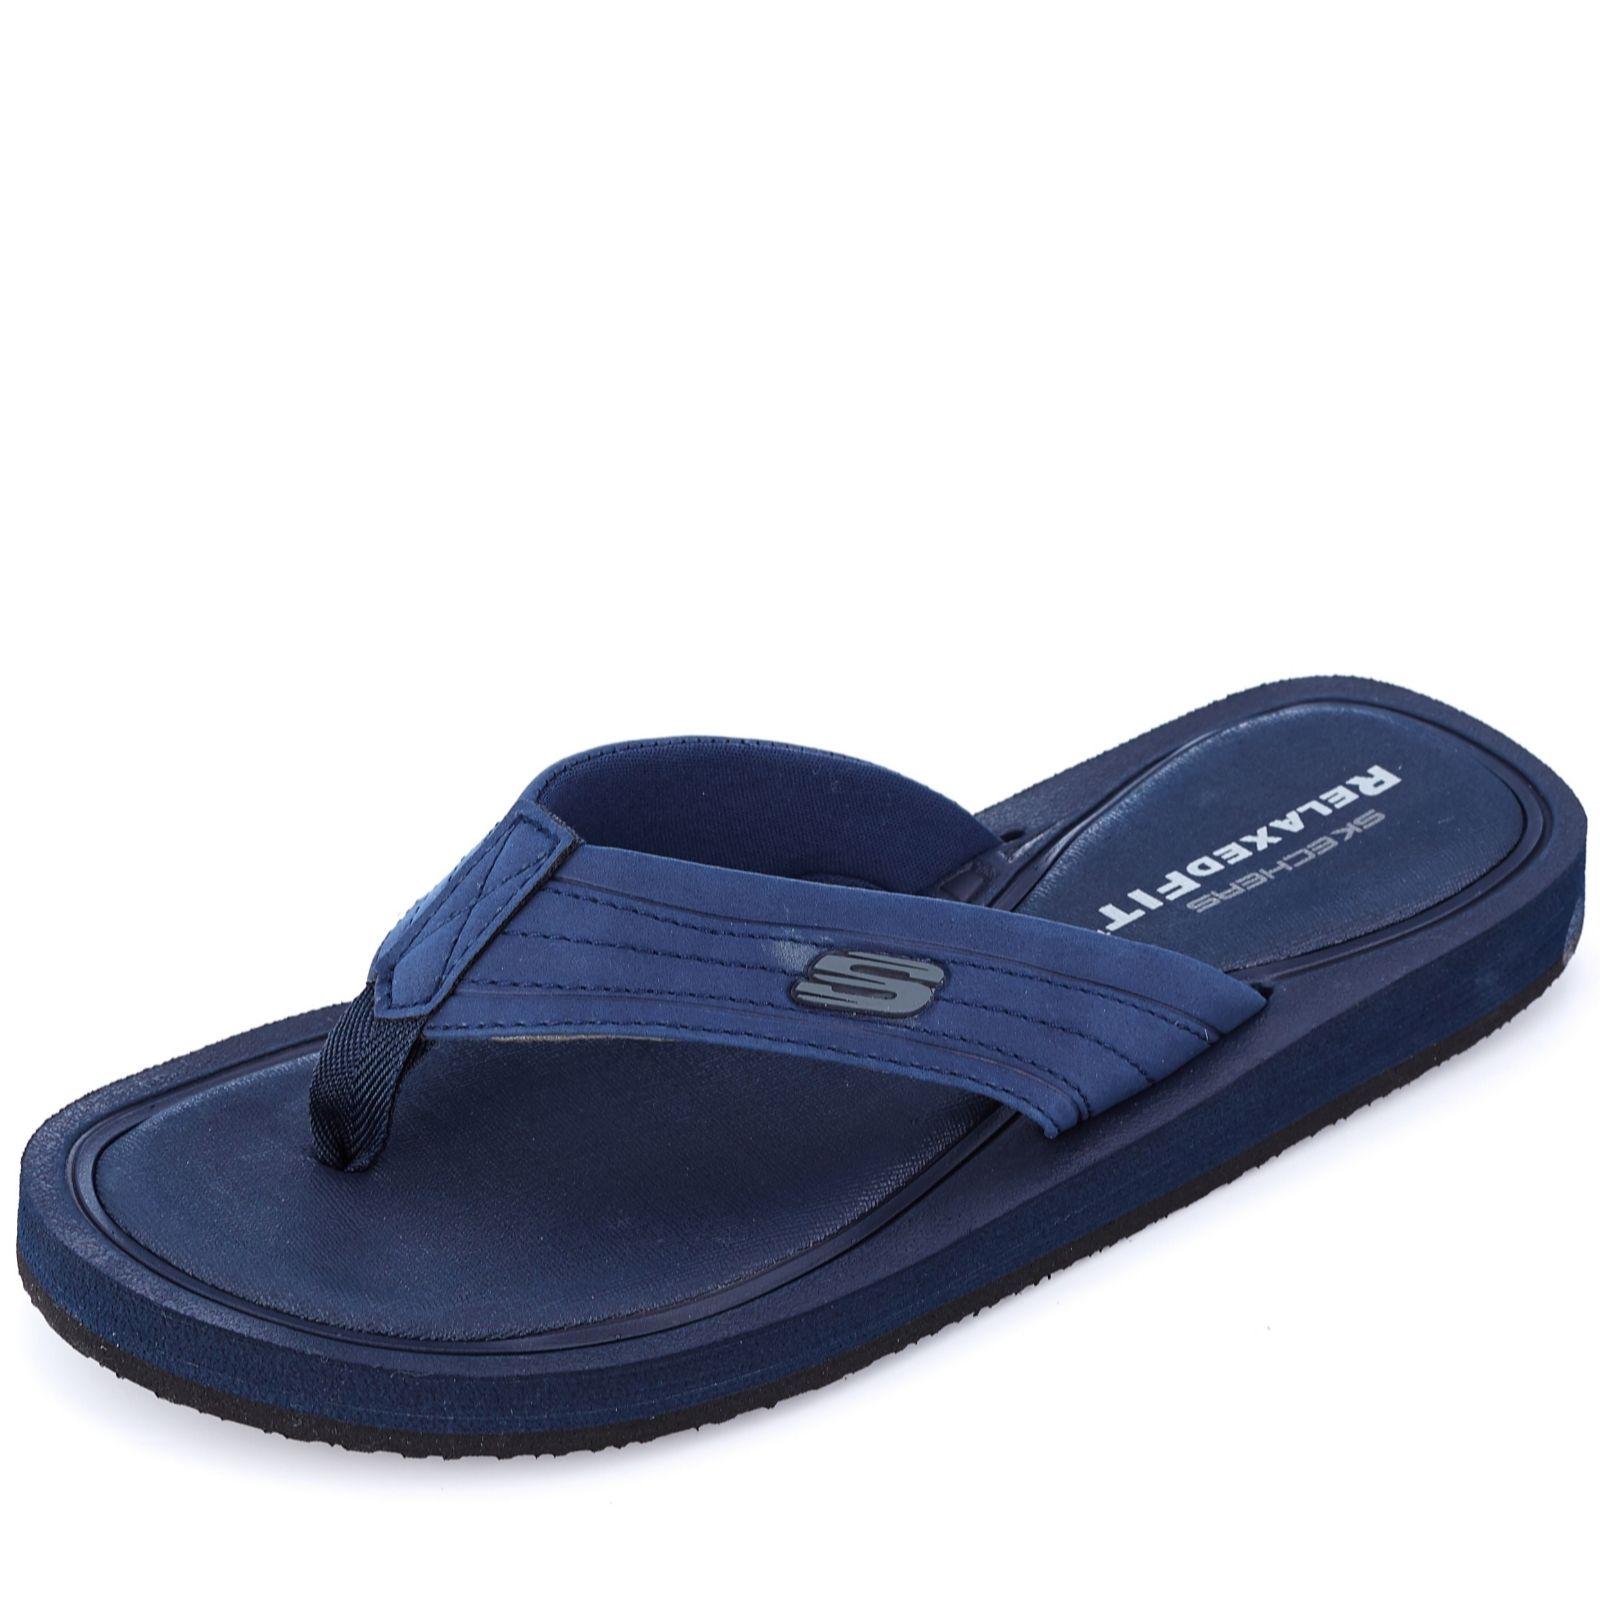 skechers mens sandals memory foam